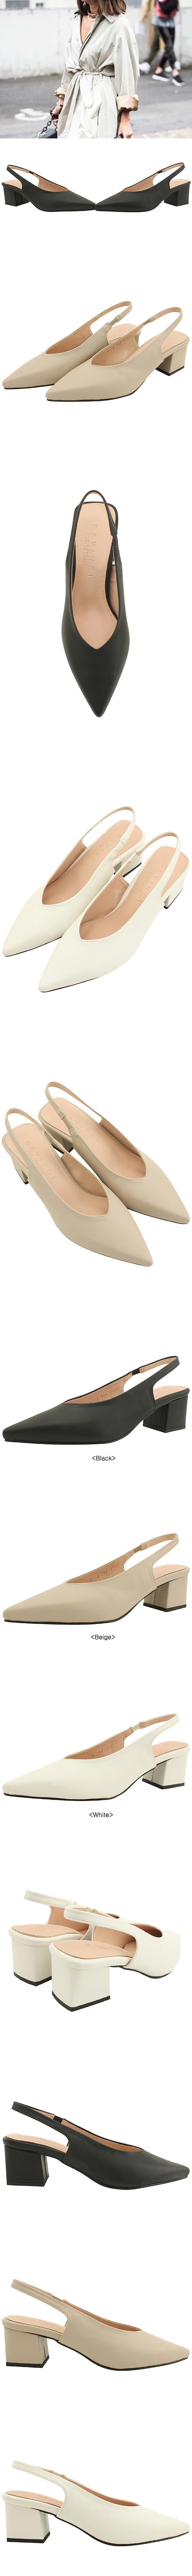 Stiletto heel slingback middle heel white